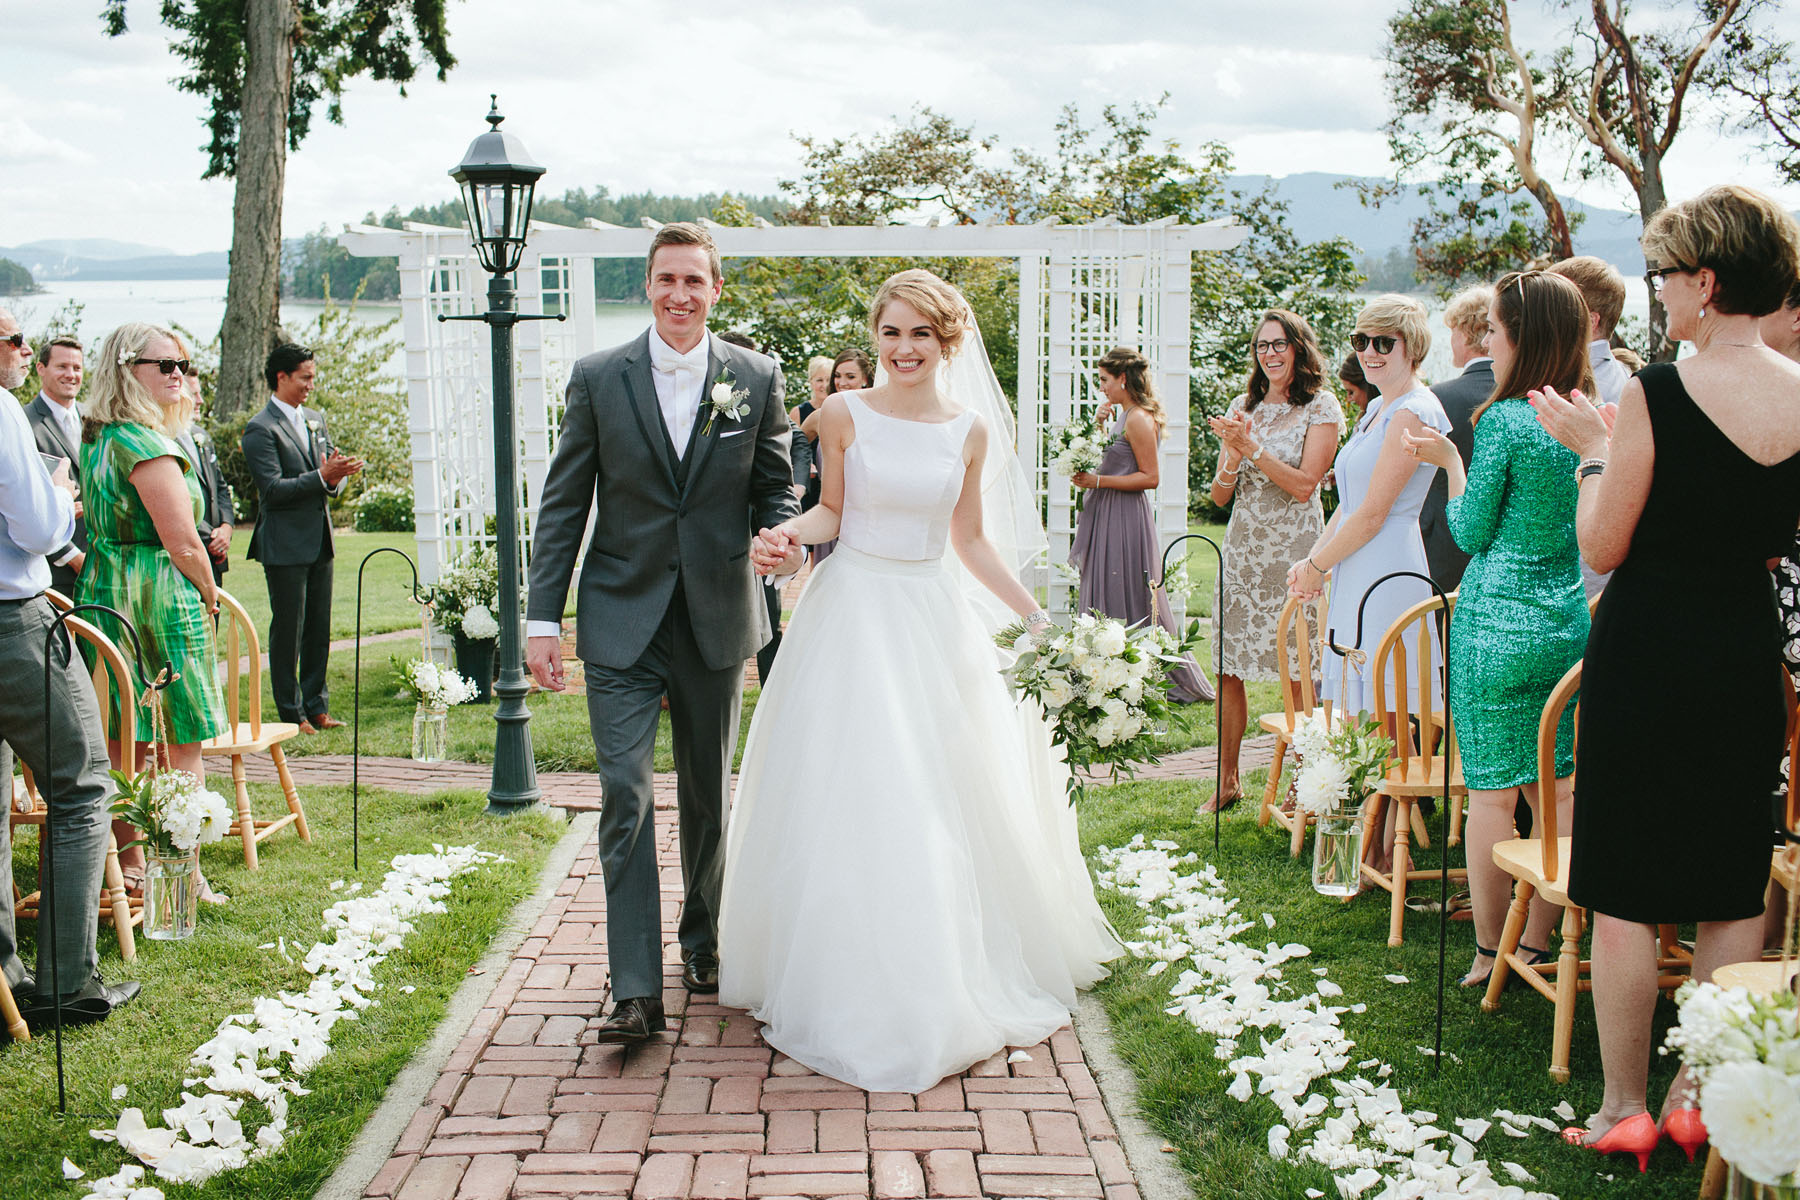 thetis-island-wedding-photographer-rp-rn-102.jpg